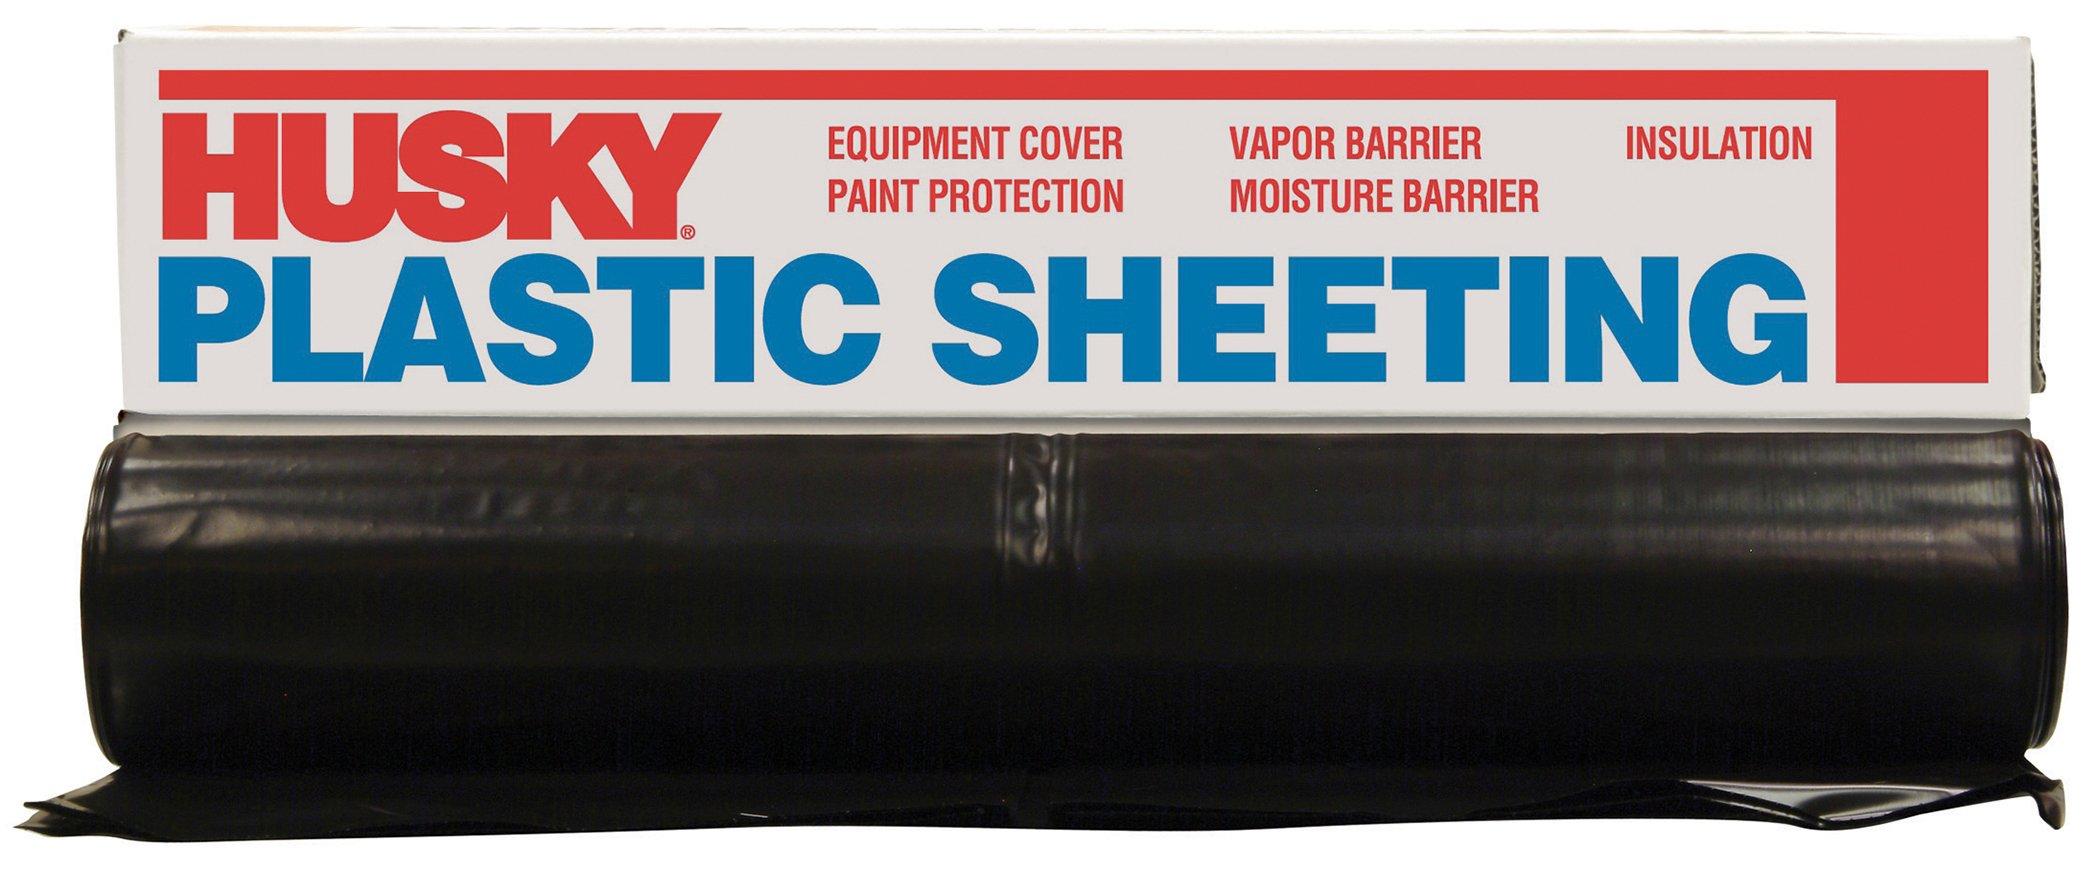 Husky CF0420-50B 4 ML Polyethylene Plastic Sheeting, 20' x 50', Black by Husky